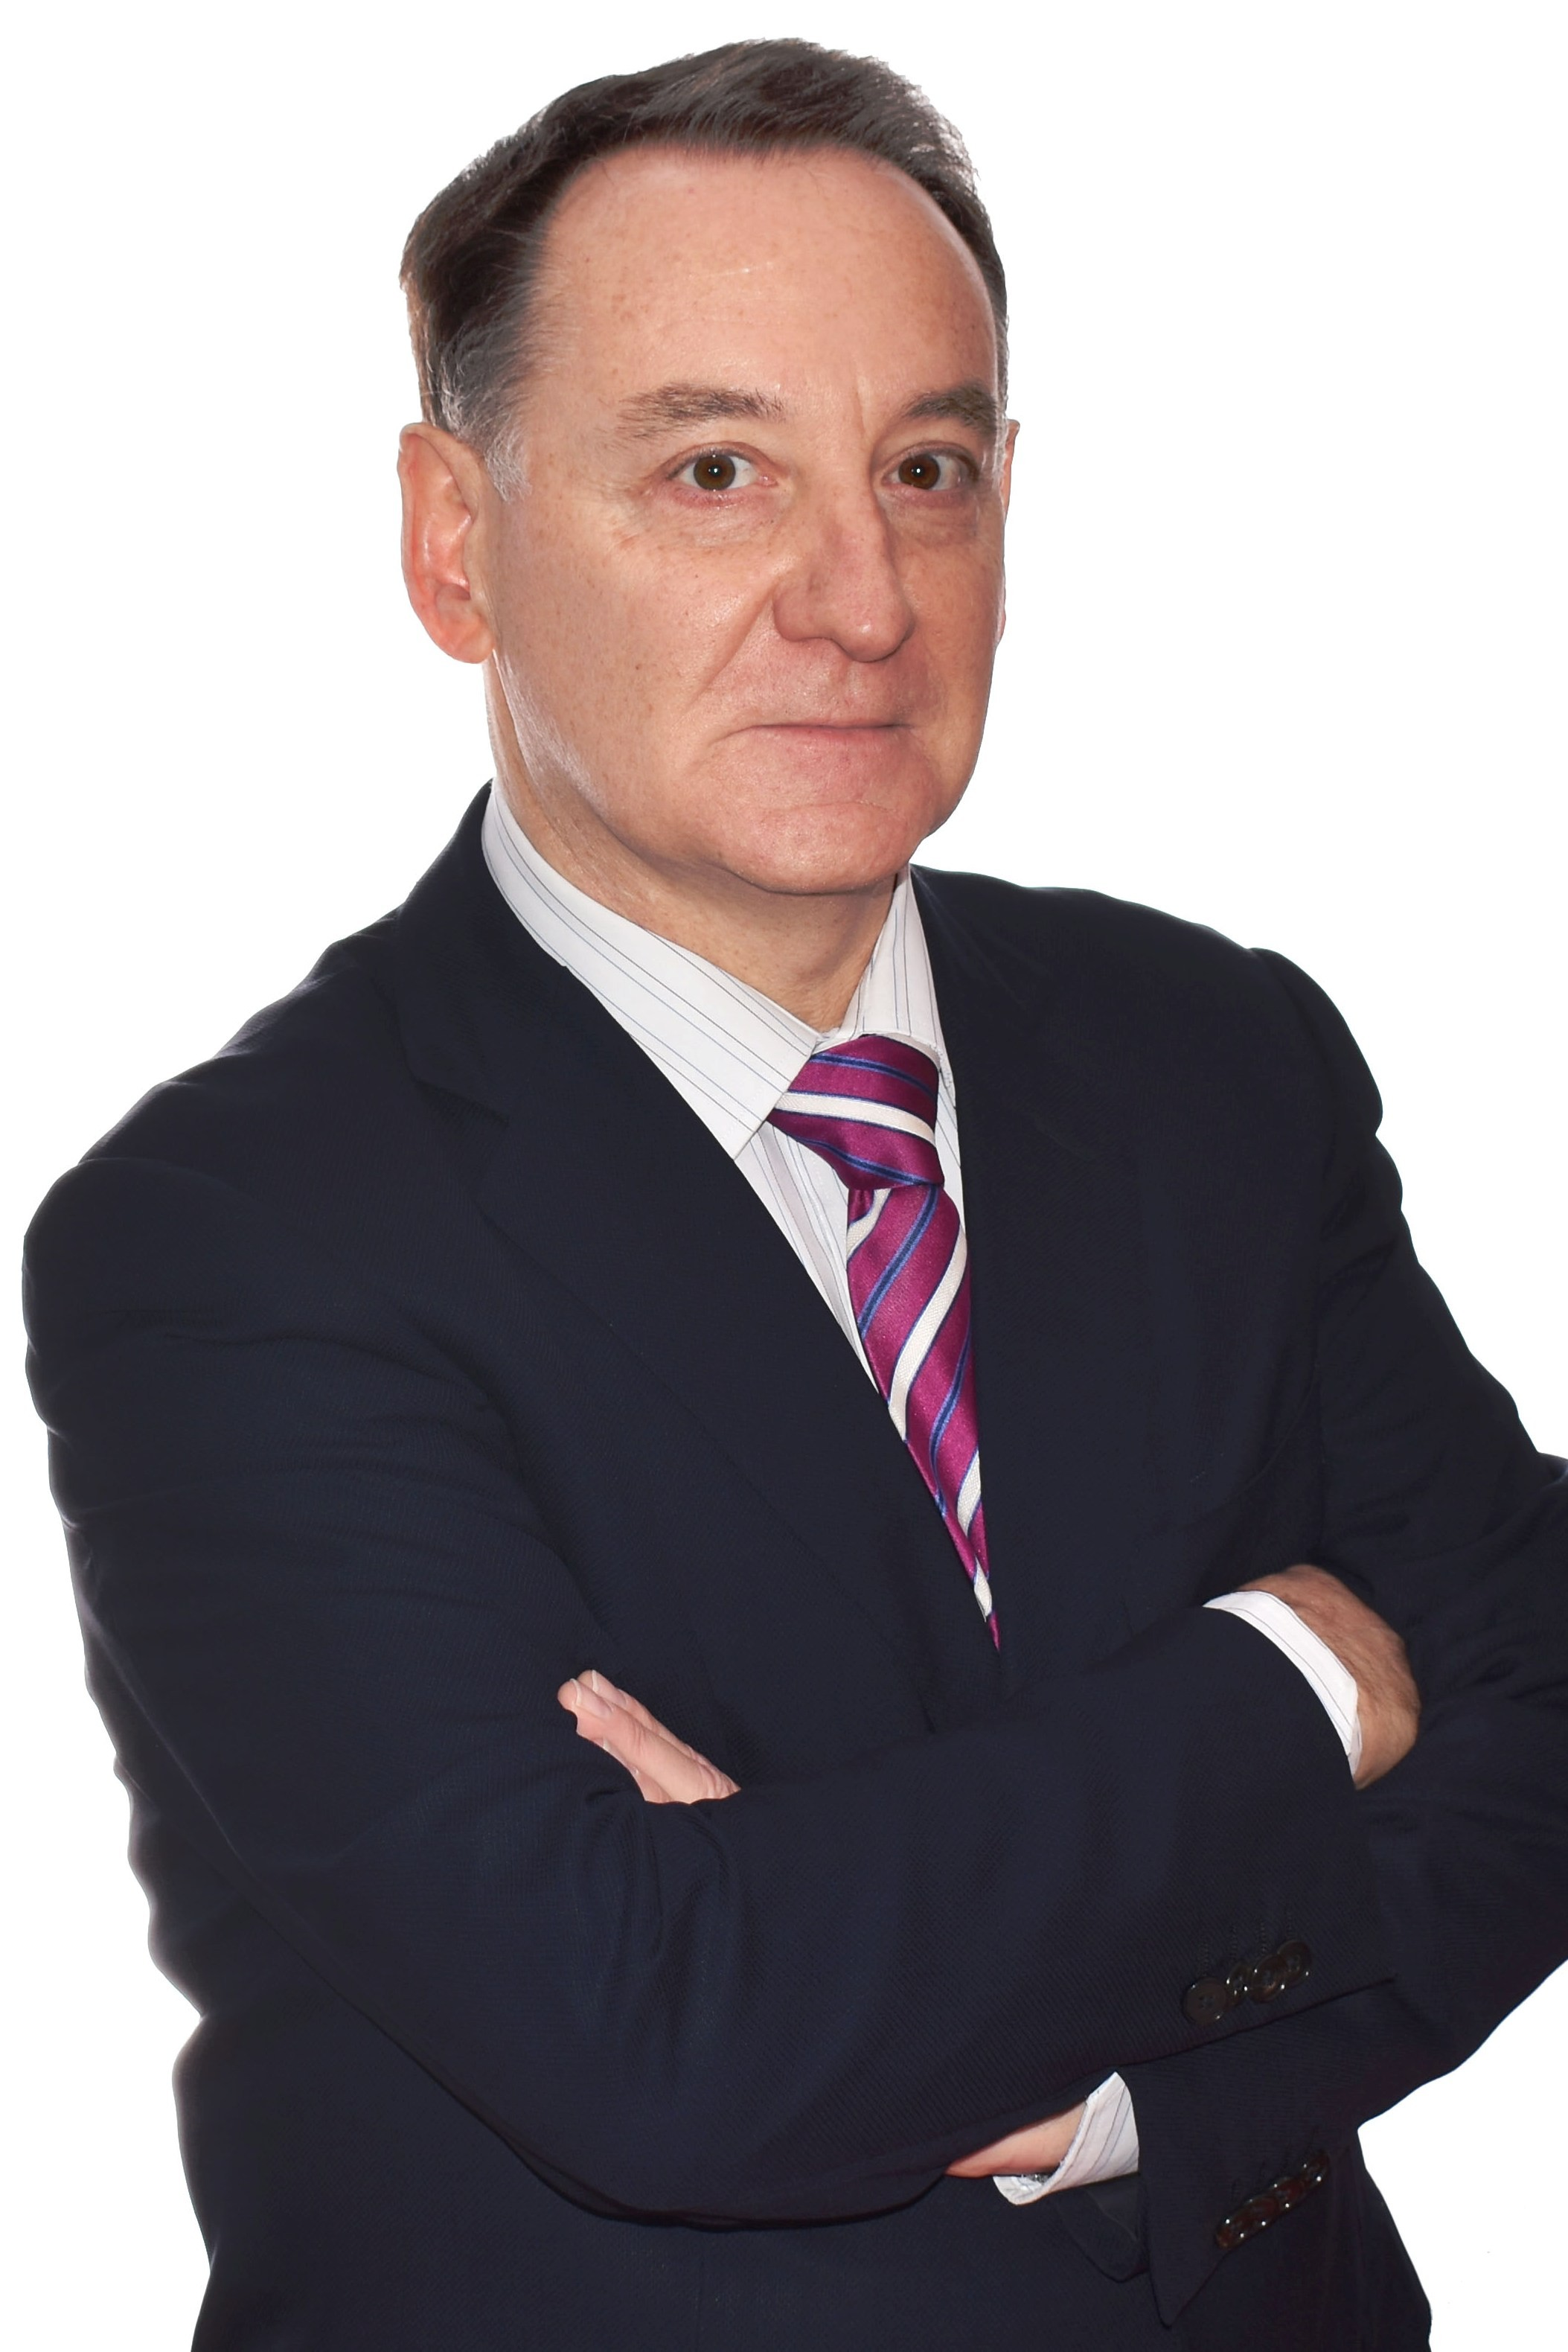 Demetrio Fenech Rivero